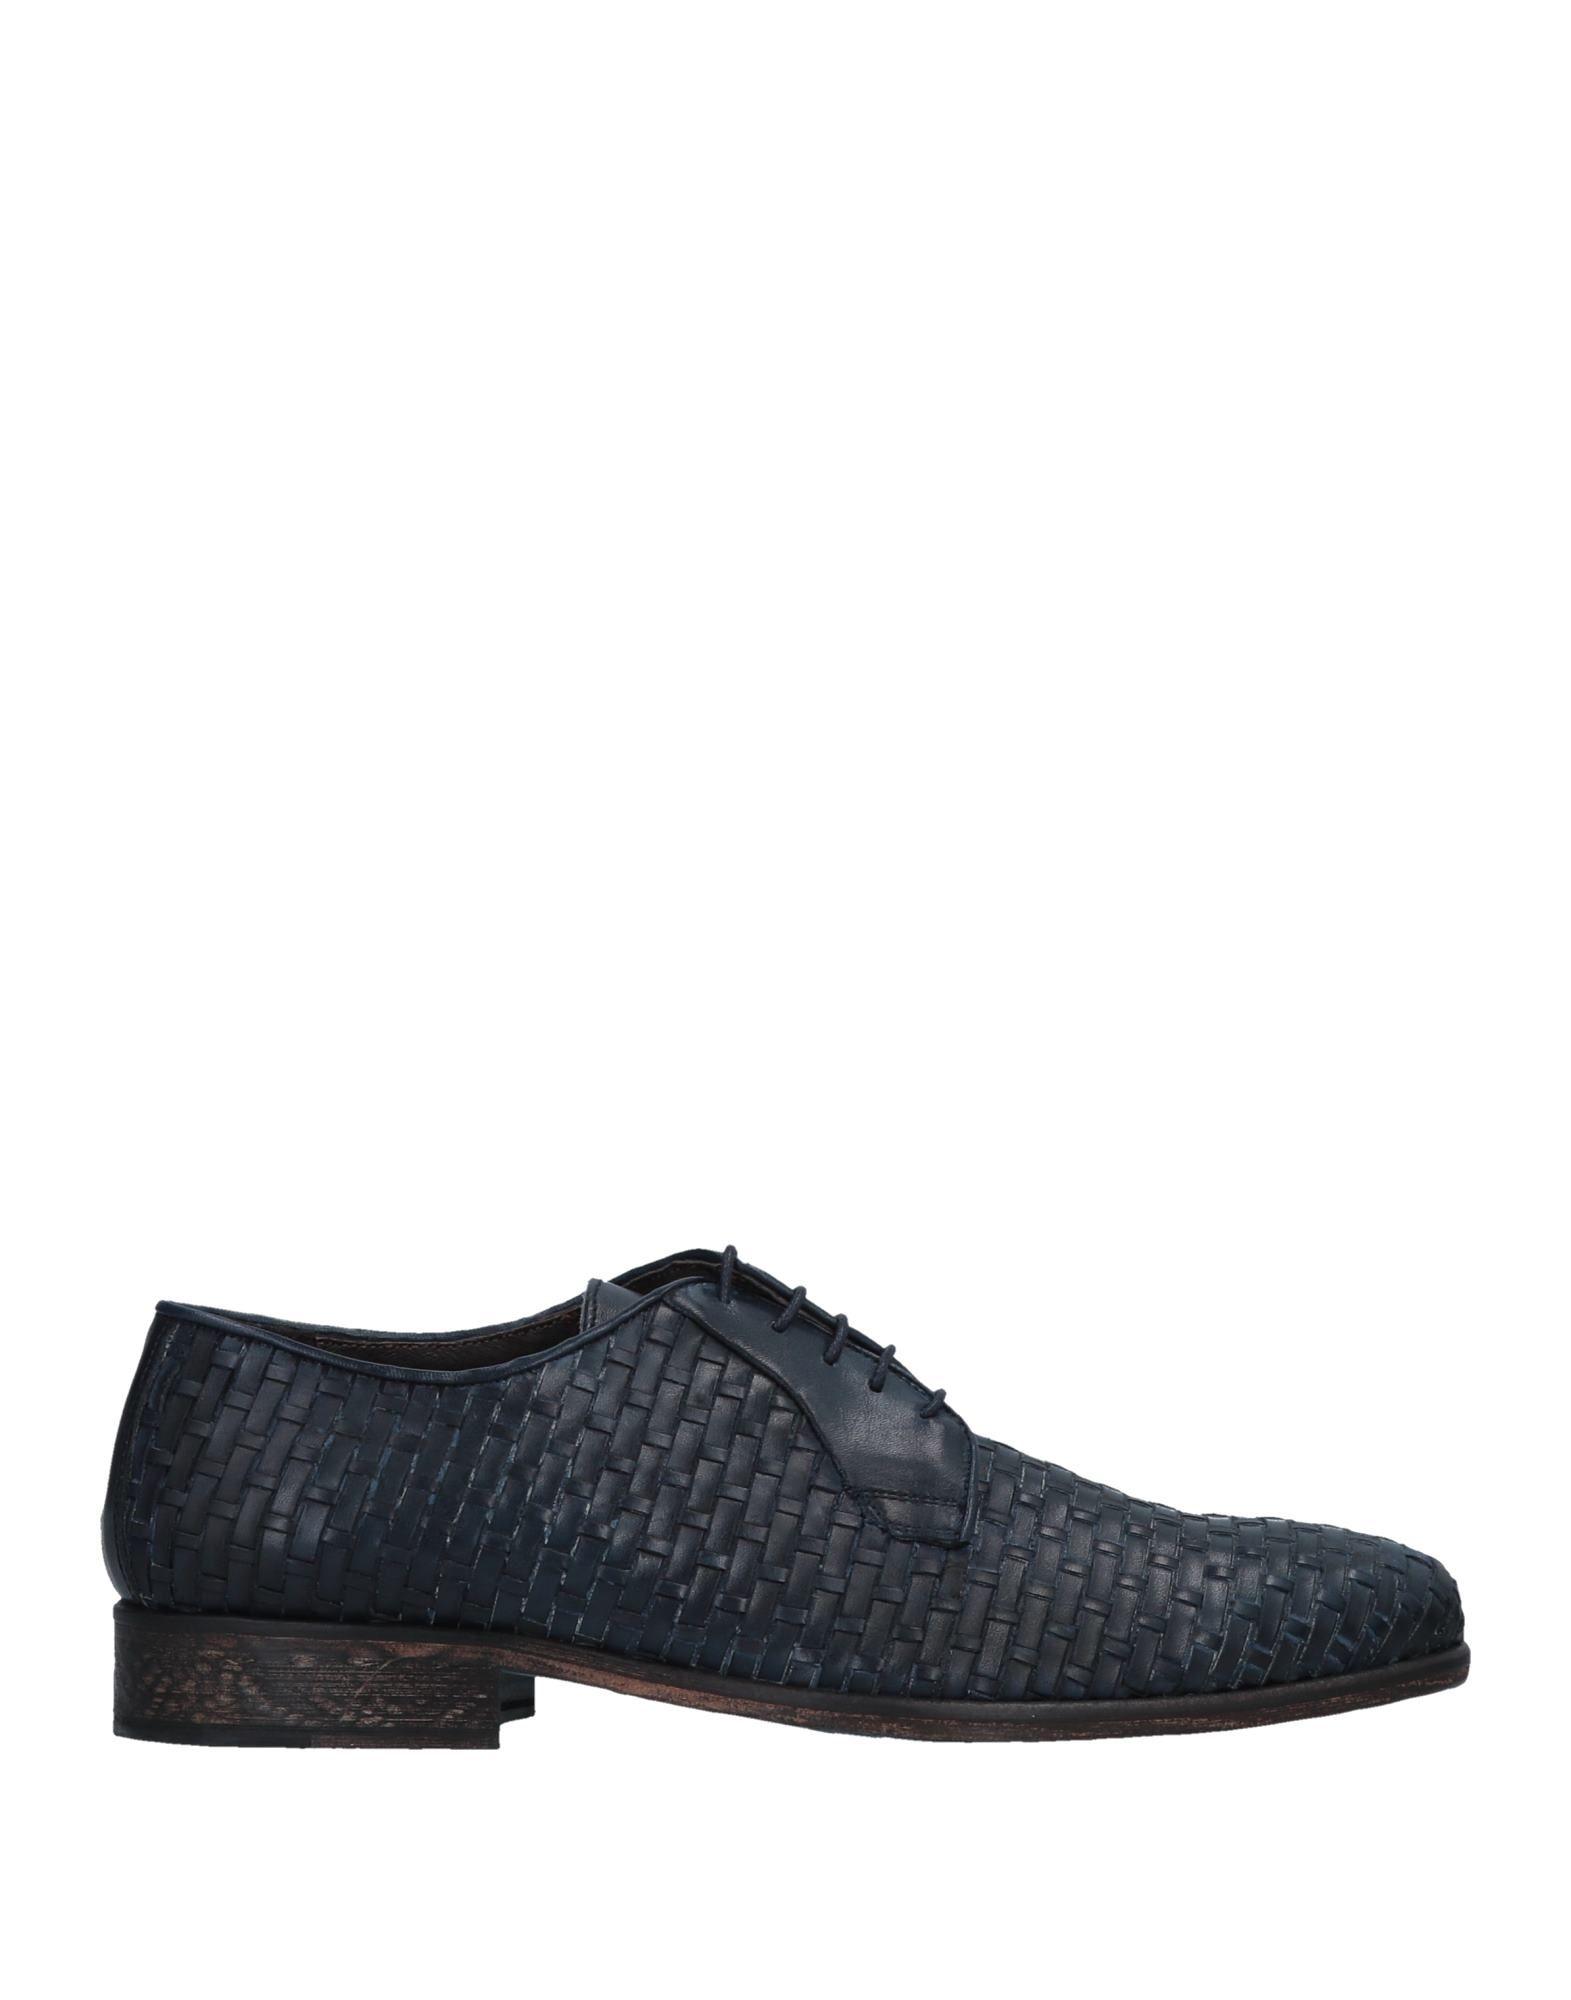 DANIELE ALESSANDRINI Обувь на шнурках eddy daniele обувь на шнурках